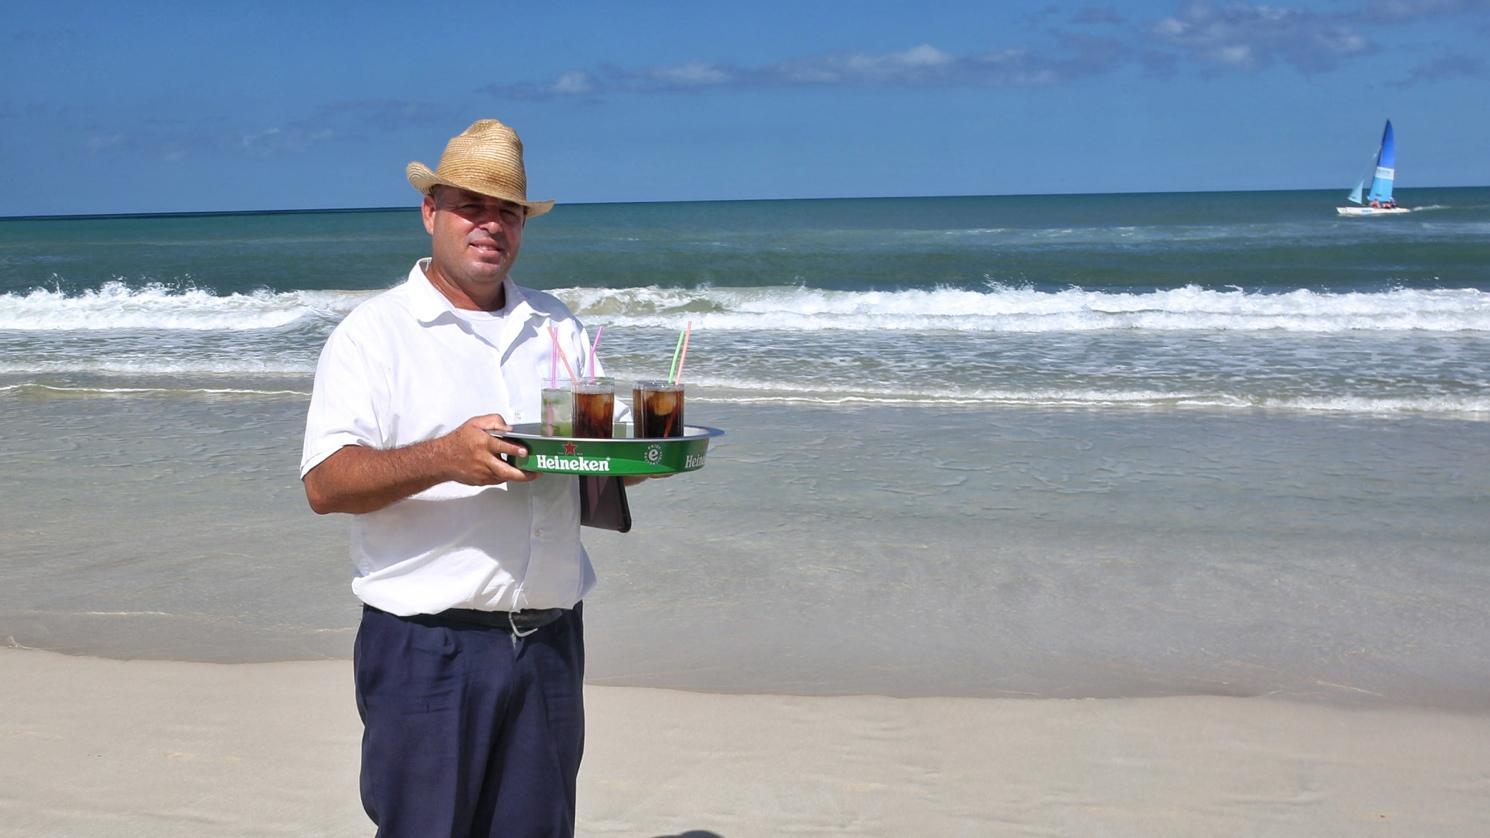 Cold drinks at Playa del Este/ Havana